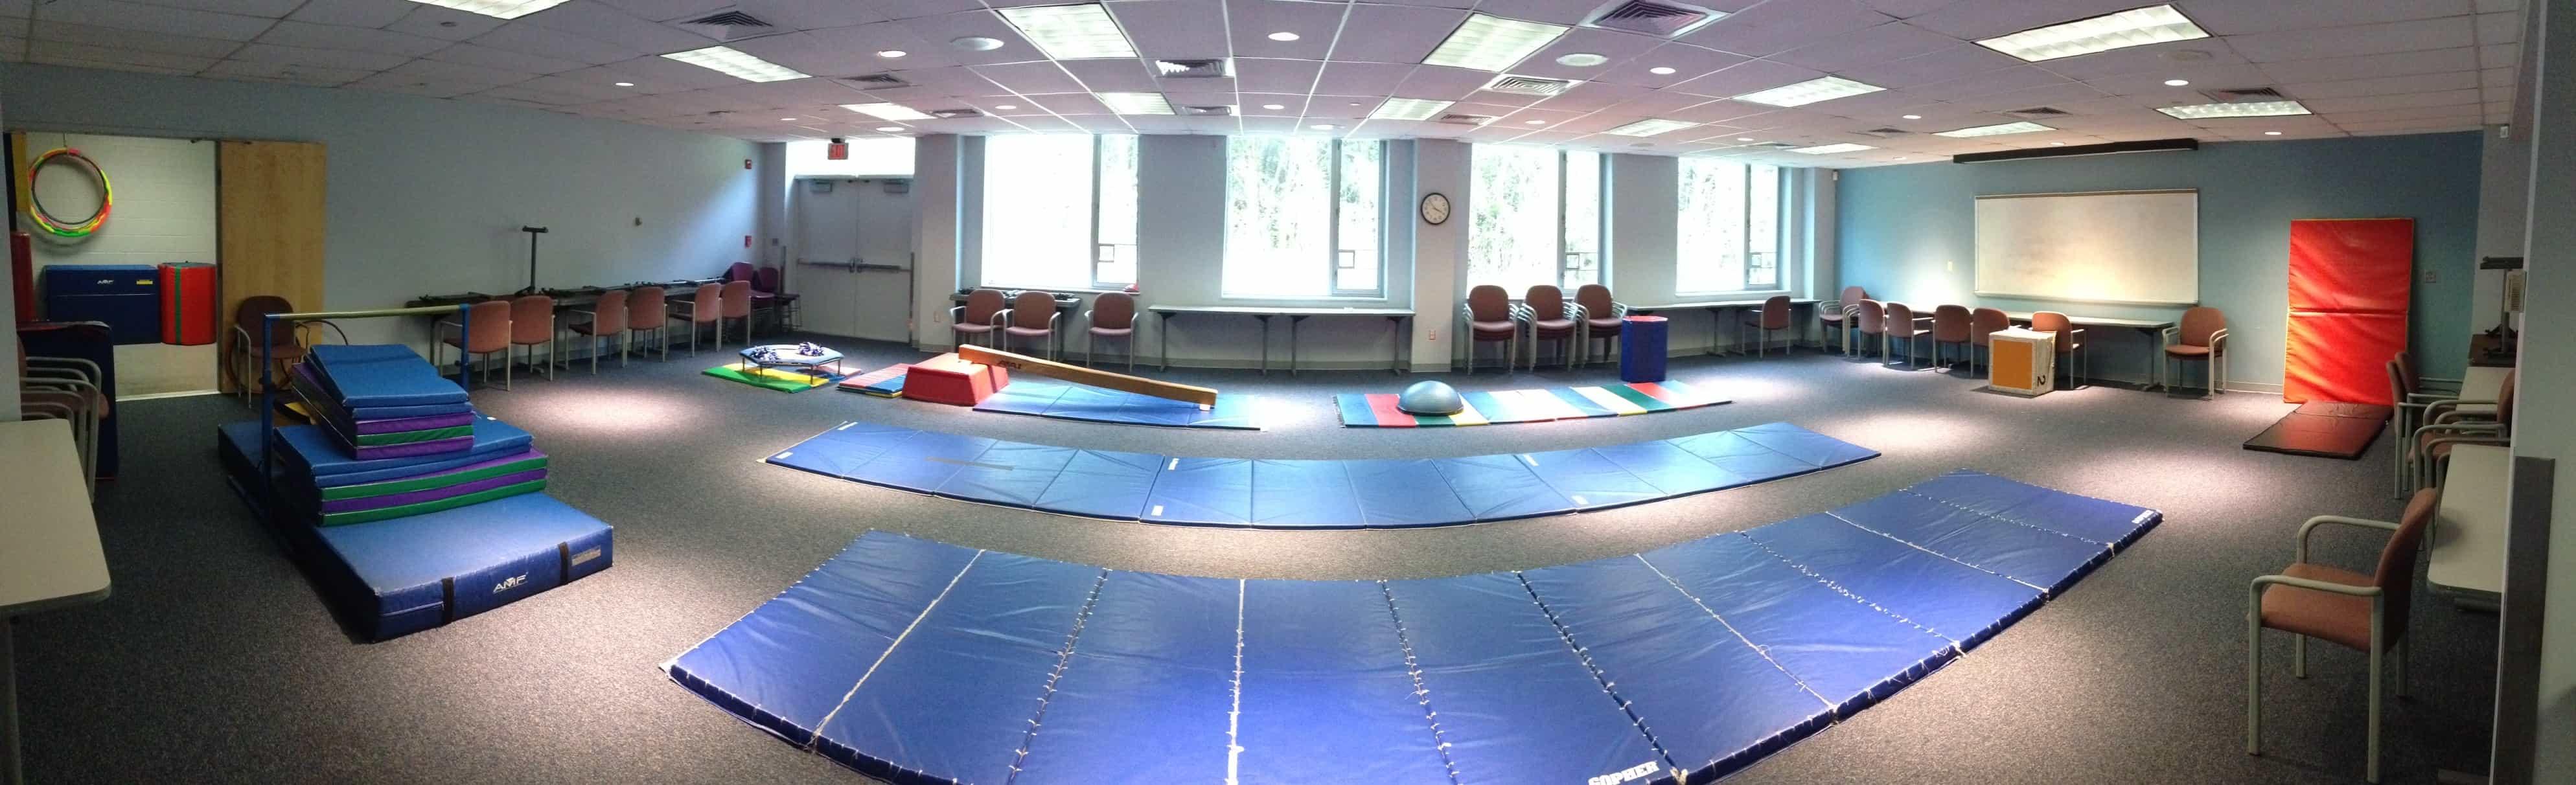 Gymnastic party room setup